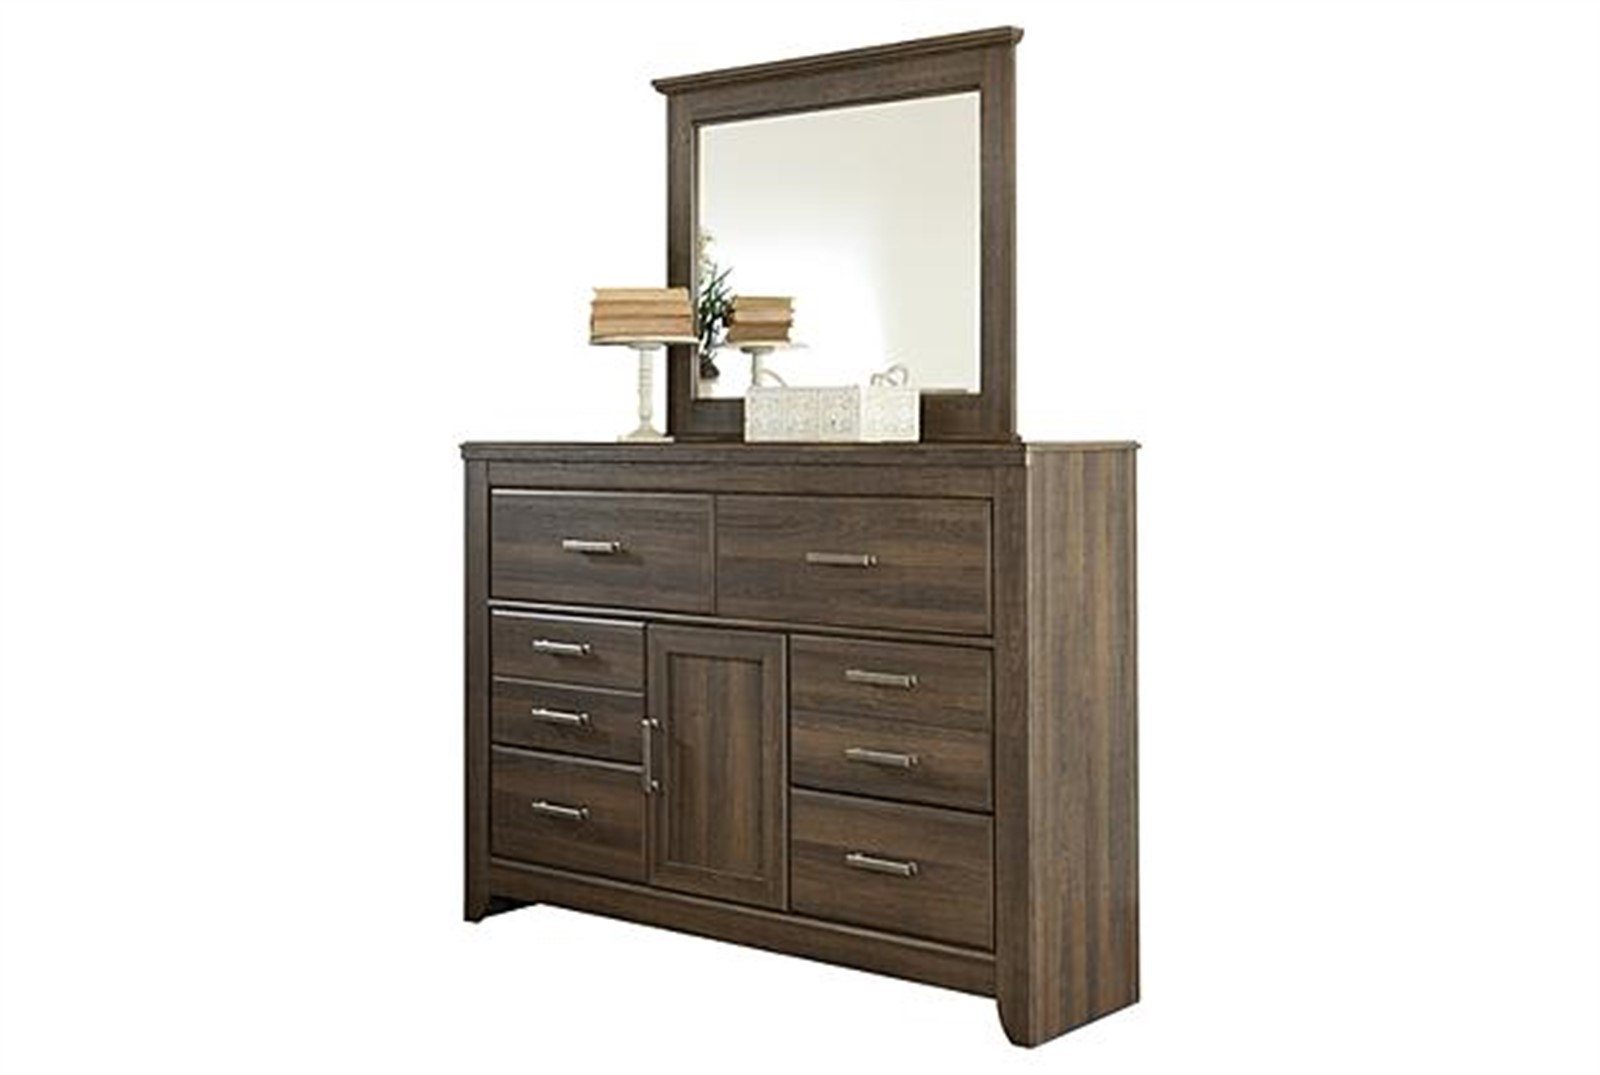 Juararo Dresser and Mirror Set - Dark Brown